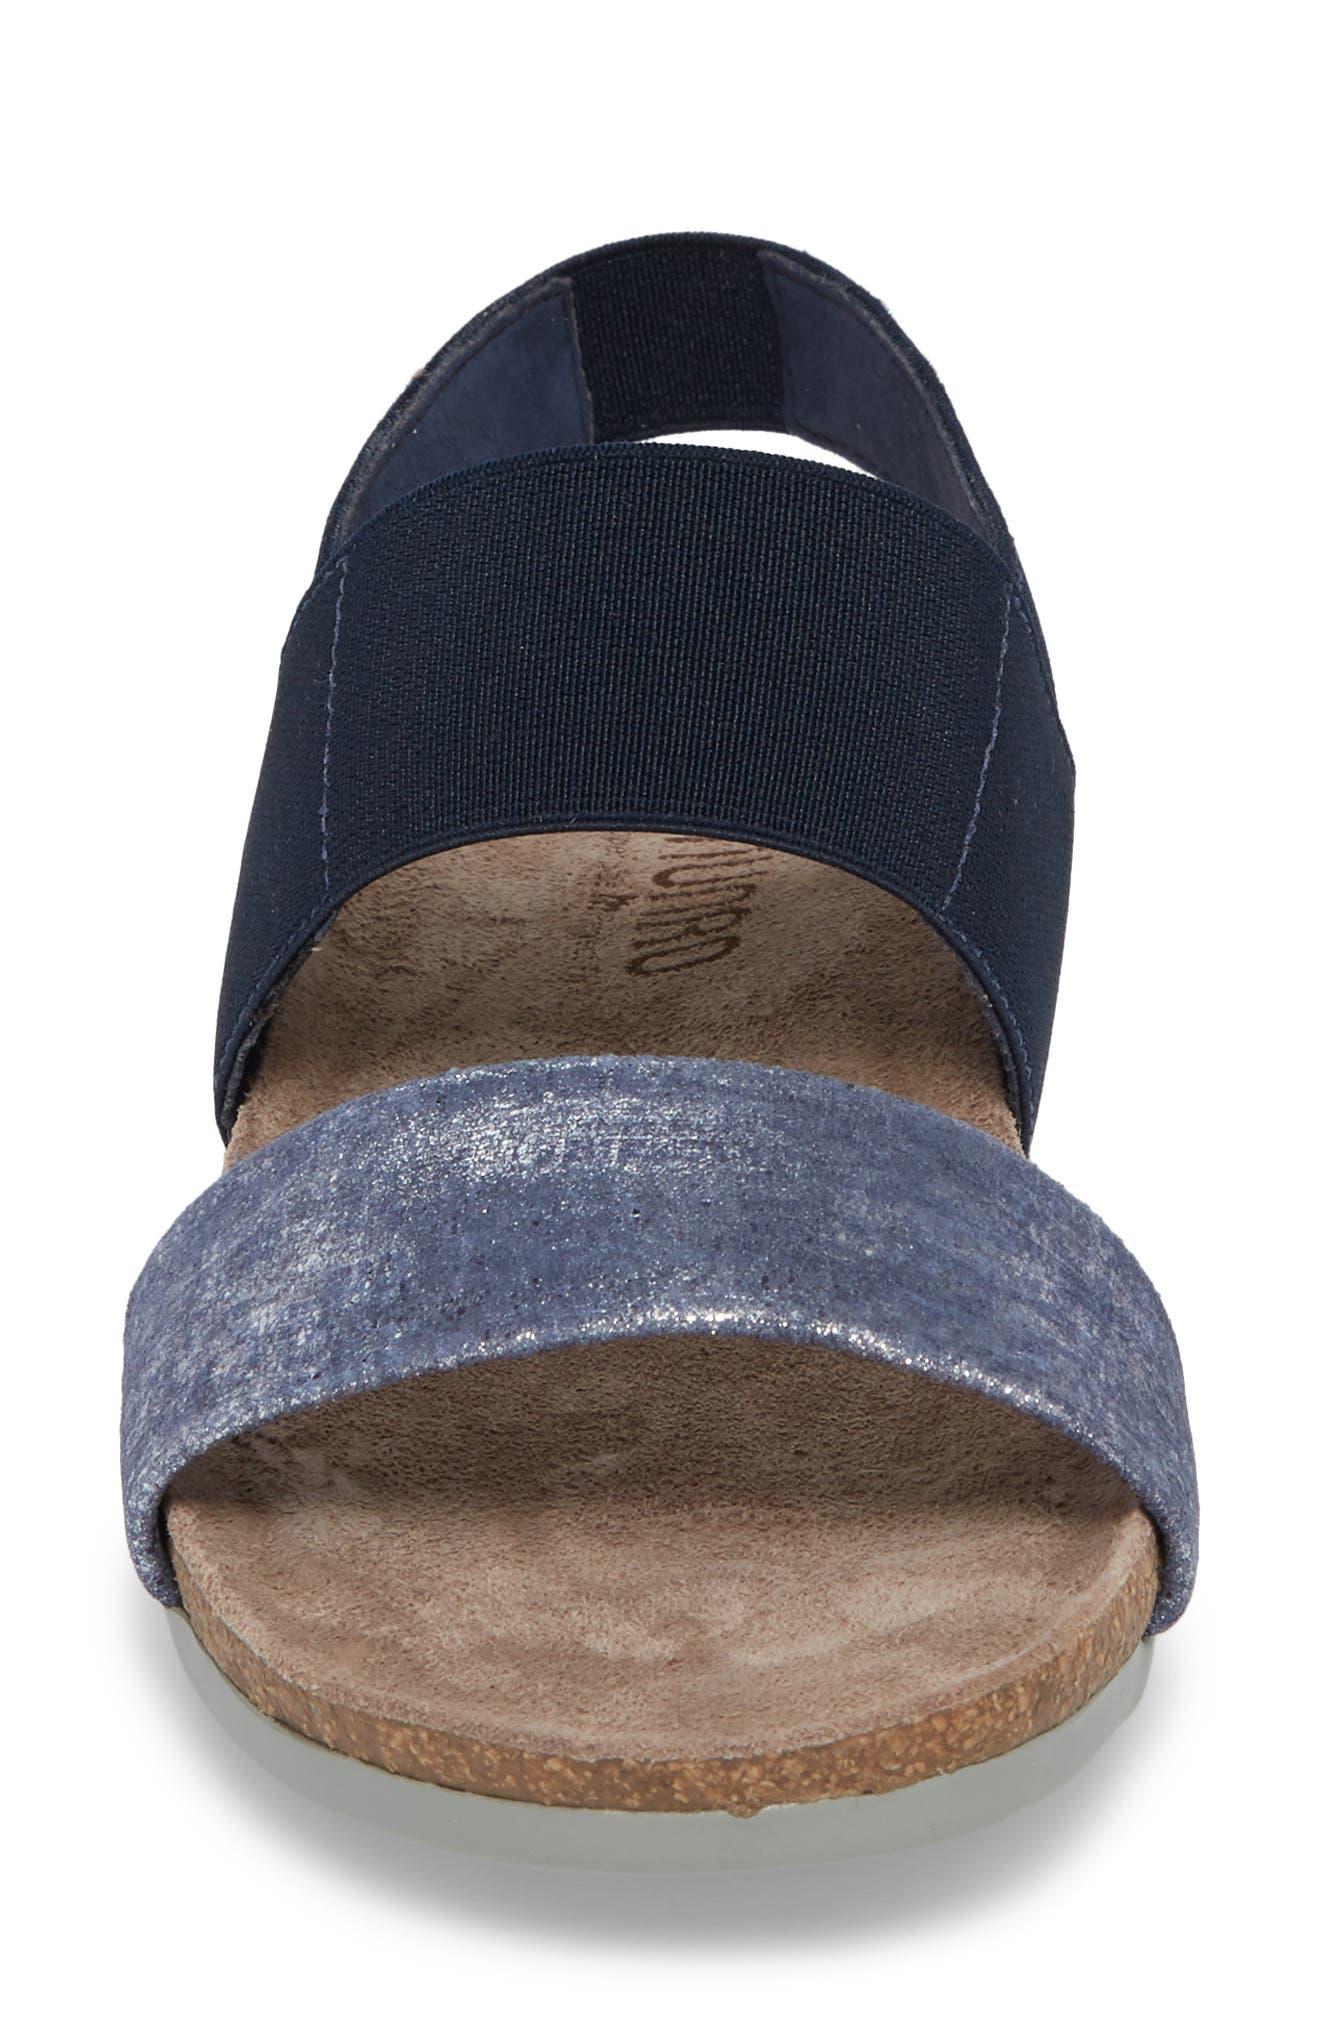 'Pisces' Sandal,                             Alternate thumbnail 4, color,                             BLUE/ SILVER METALLIC